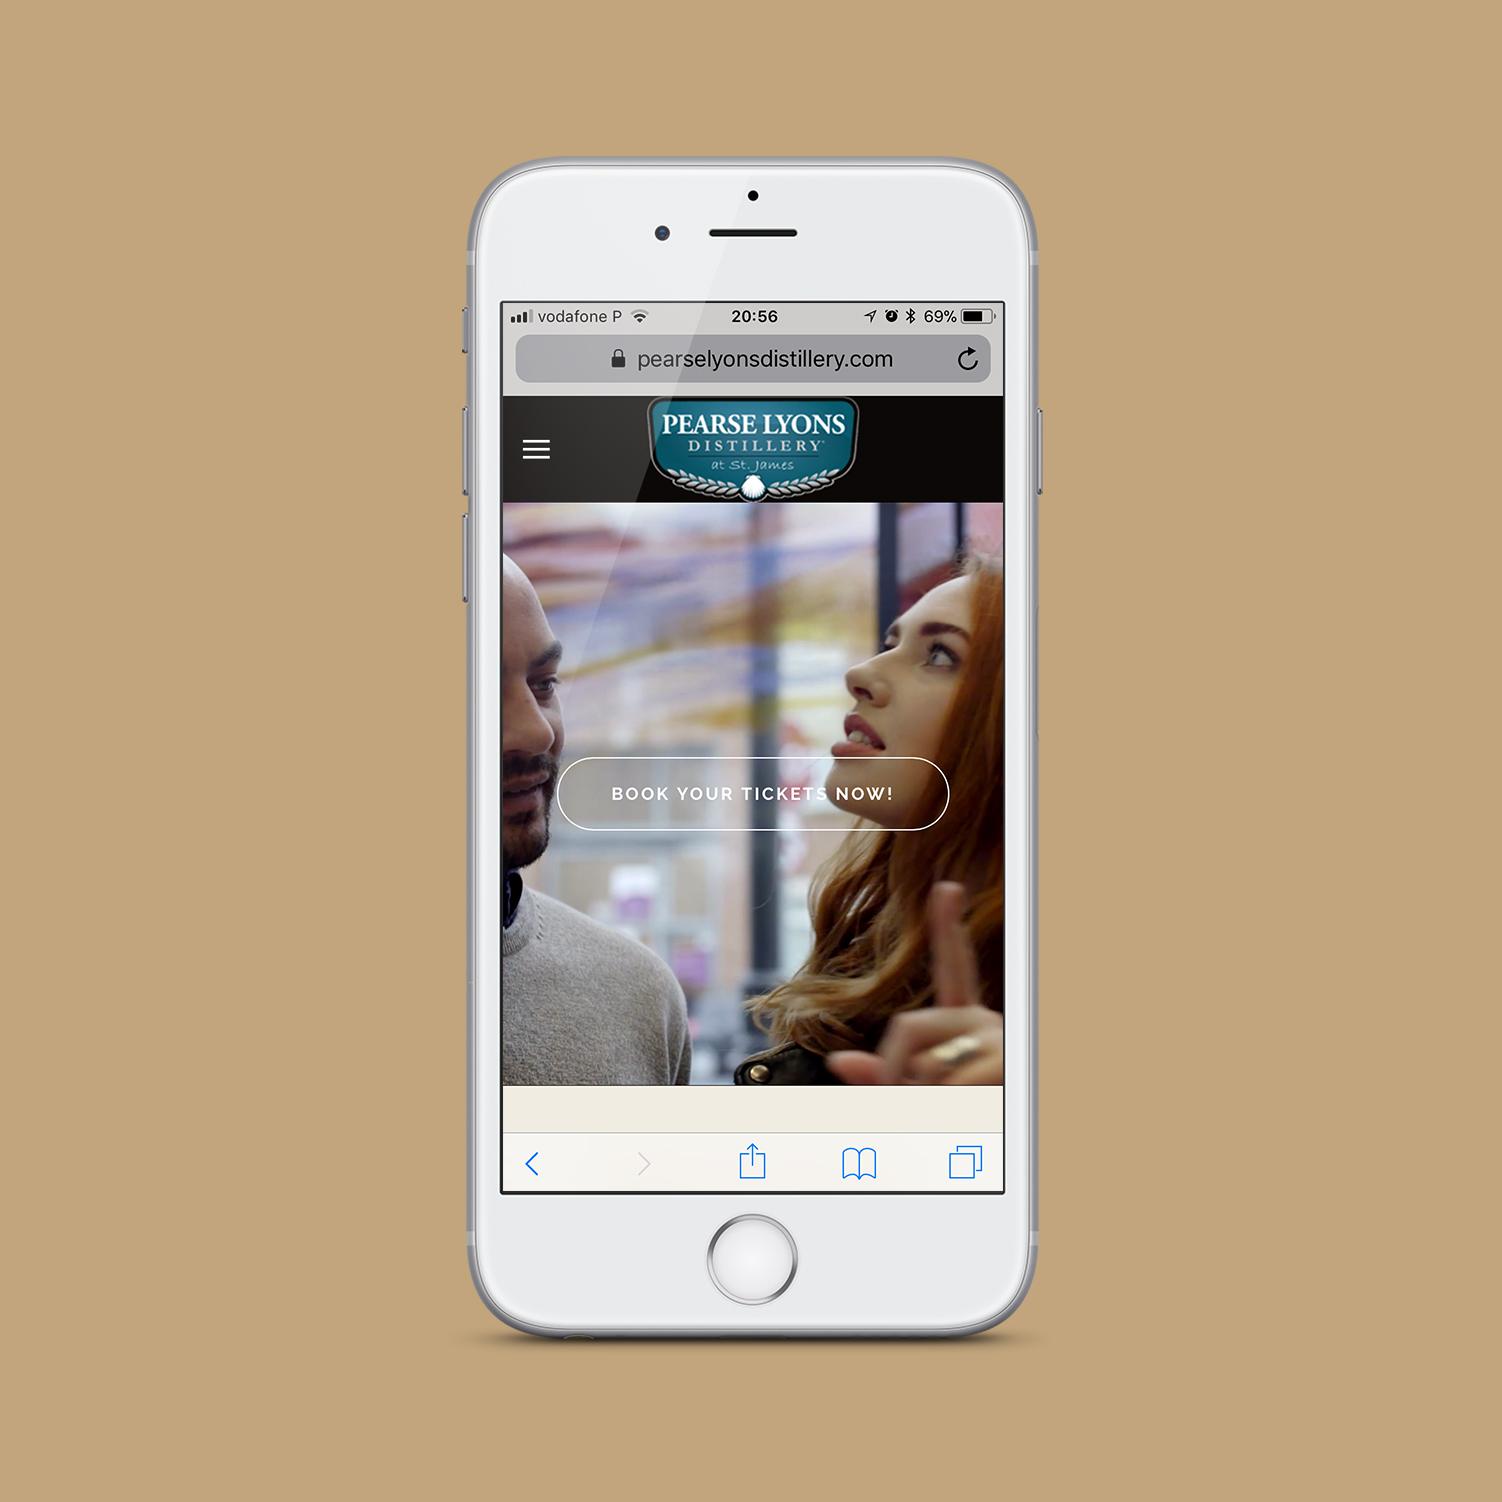 pld-site-iphone2.jpg